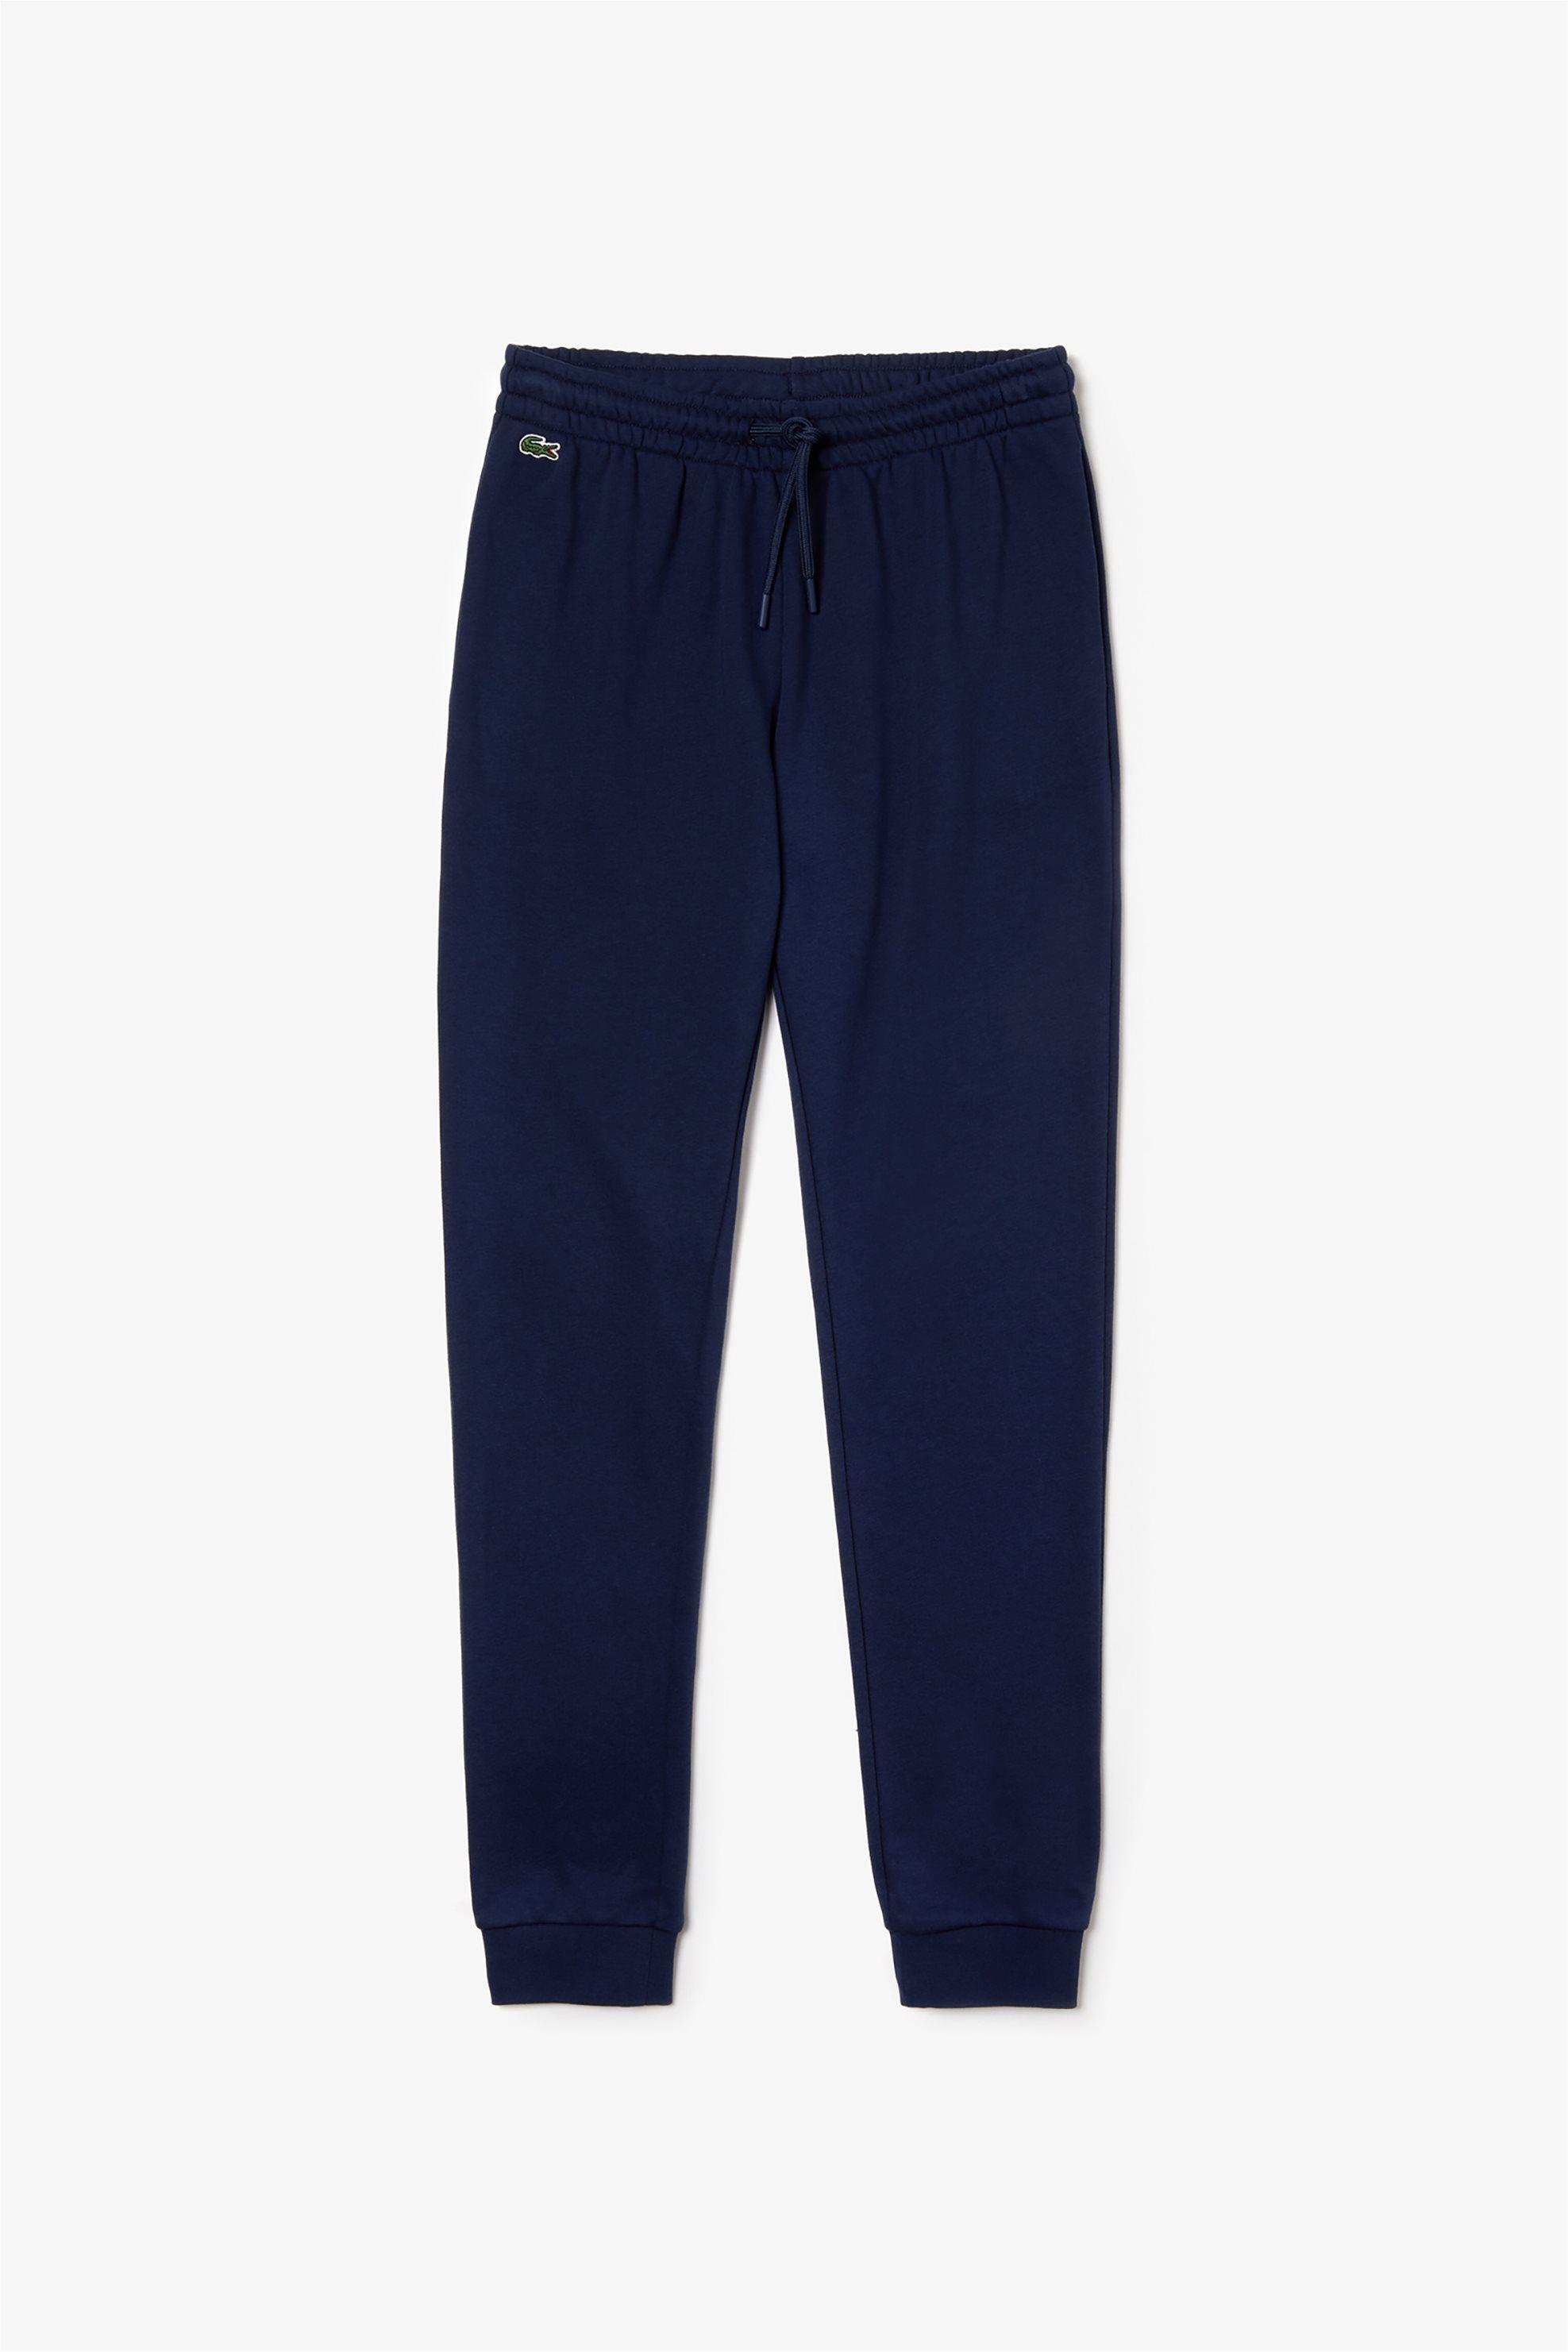 Lacoste γυναικείο παντελόνι φόρμα μονόχρωμο fleece The Spring/Summer 2019 Tennis γυναικα   ρουχα   αθλητικα   αθλητικά ρούχα   παντελόνια   ίσια γραμμή   παντελό